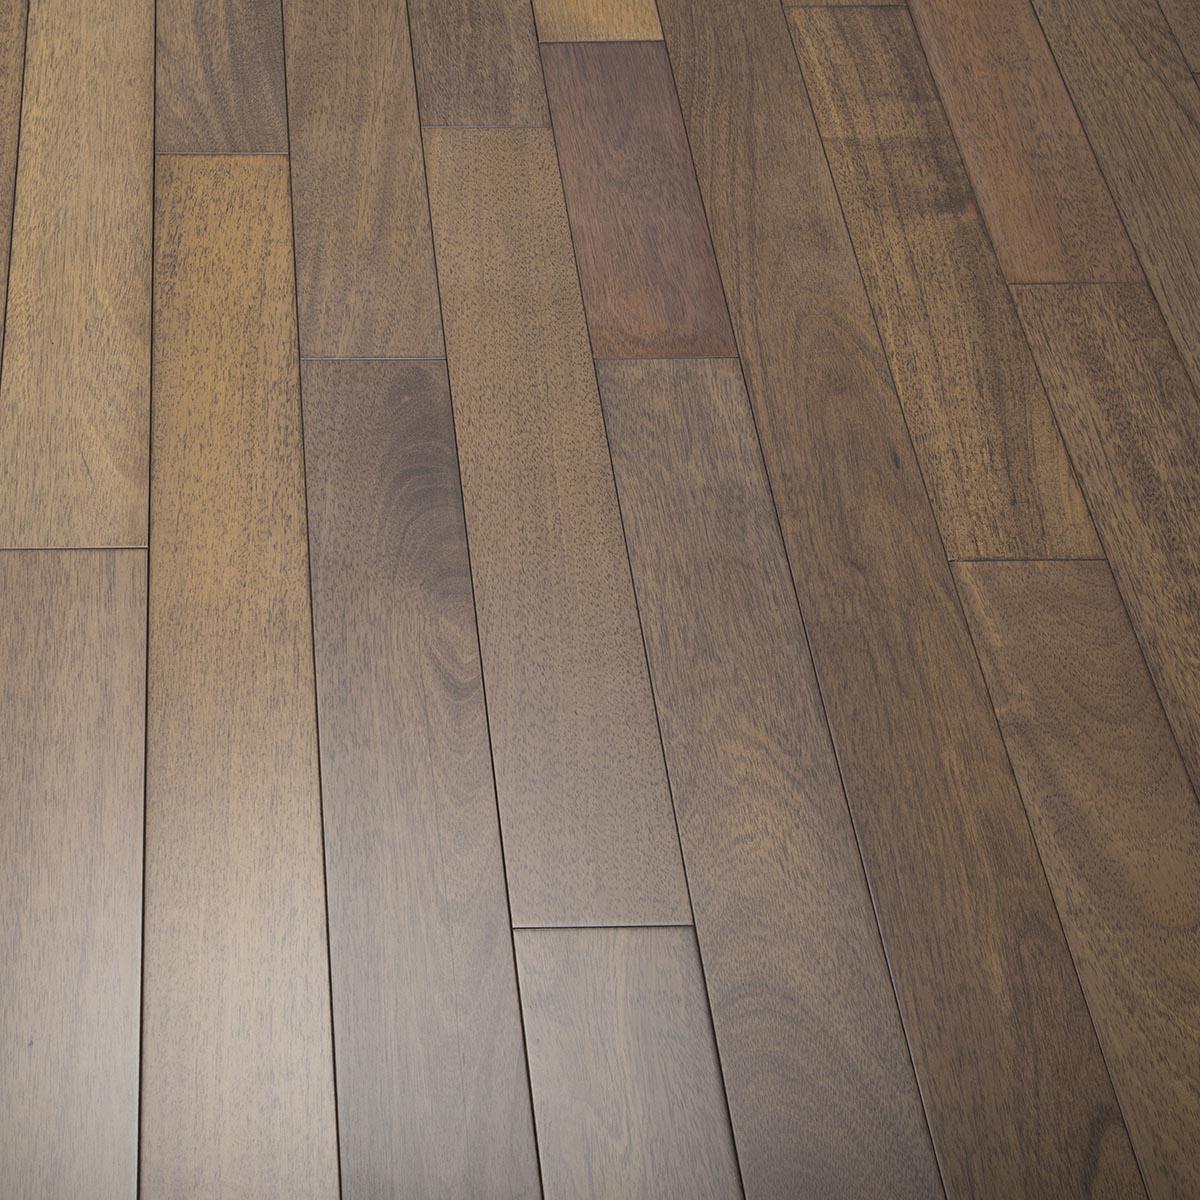 Tauari Brazilian Oak Homestead Hardwood Flooring Smooth